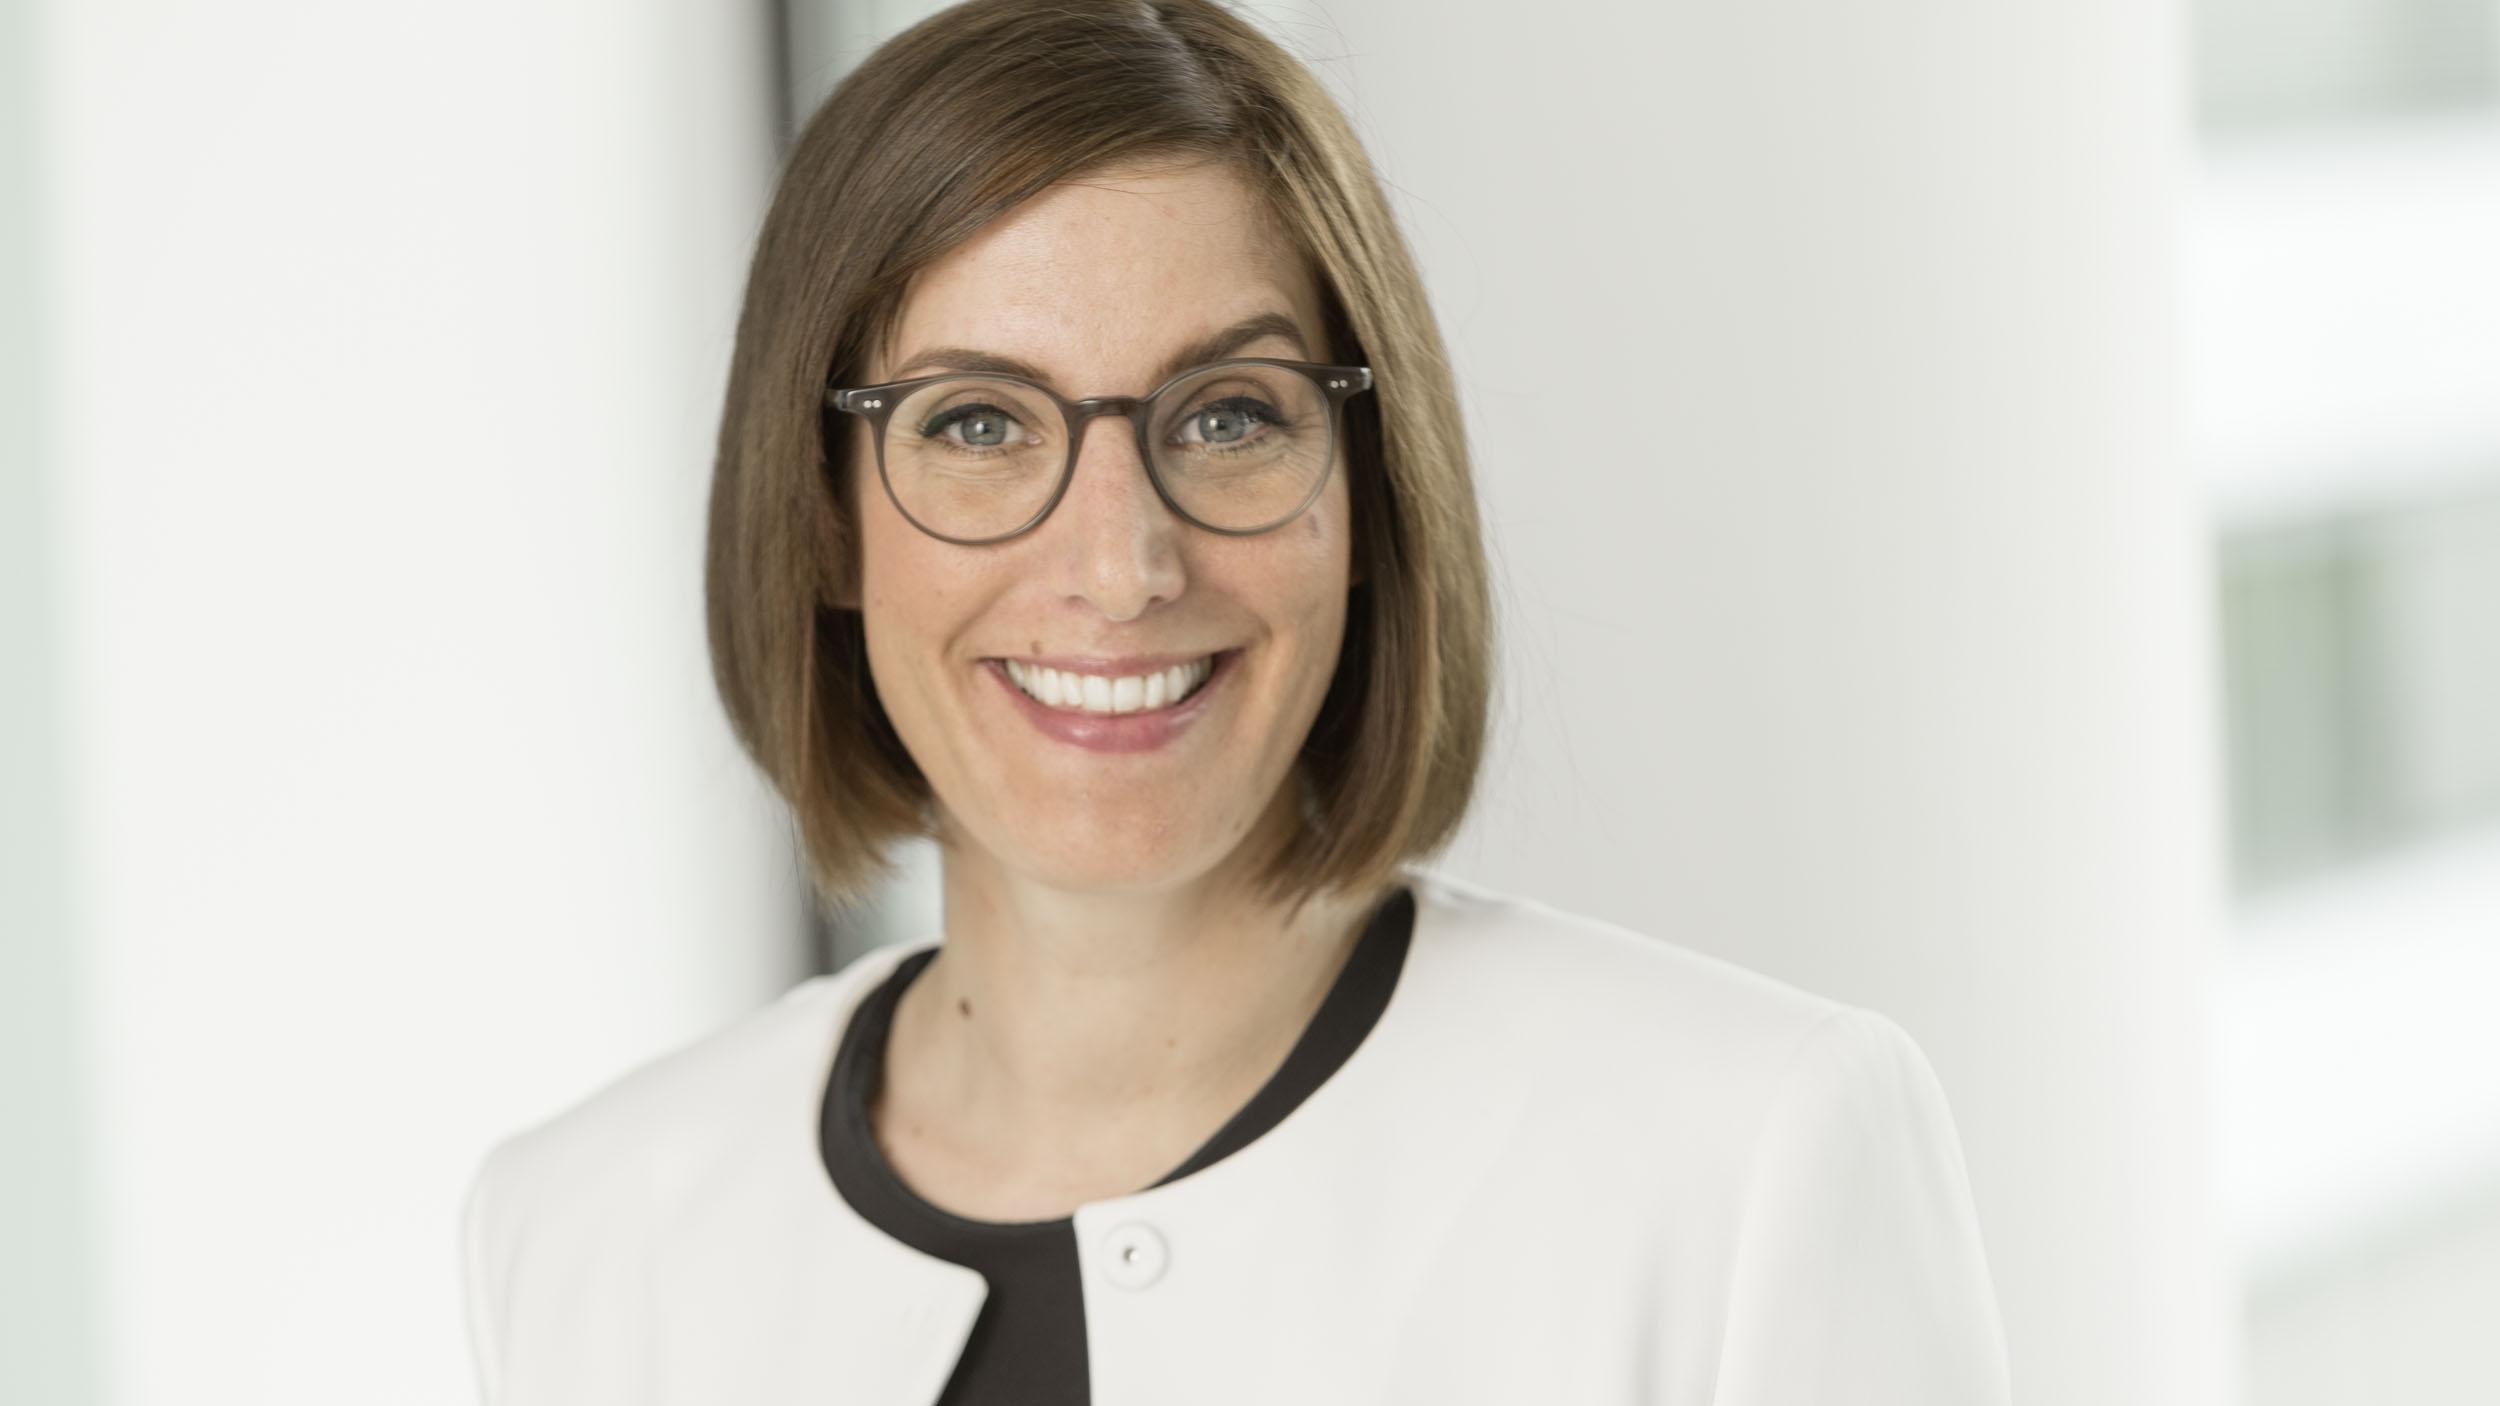 Nicole Neuer